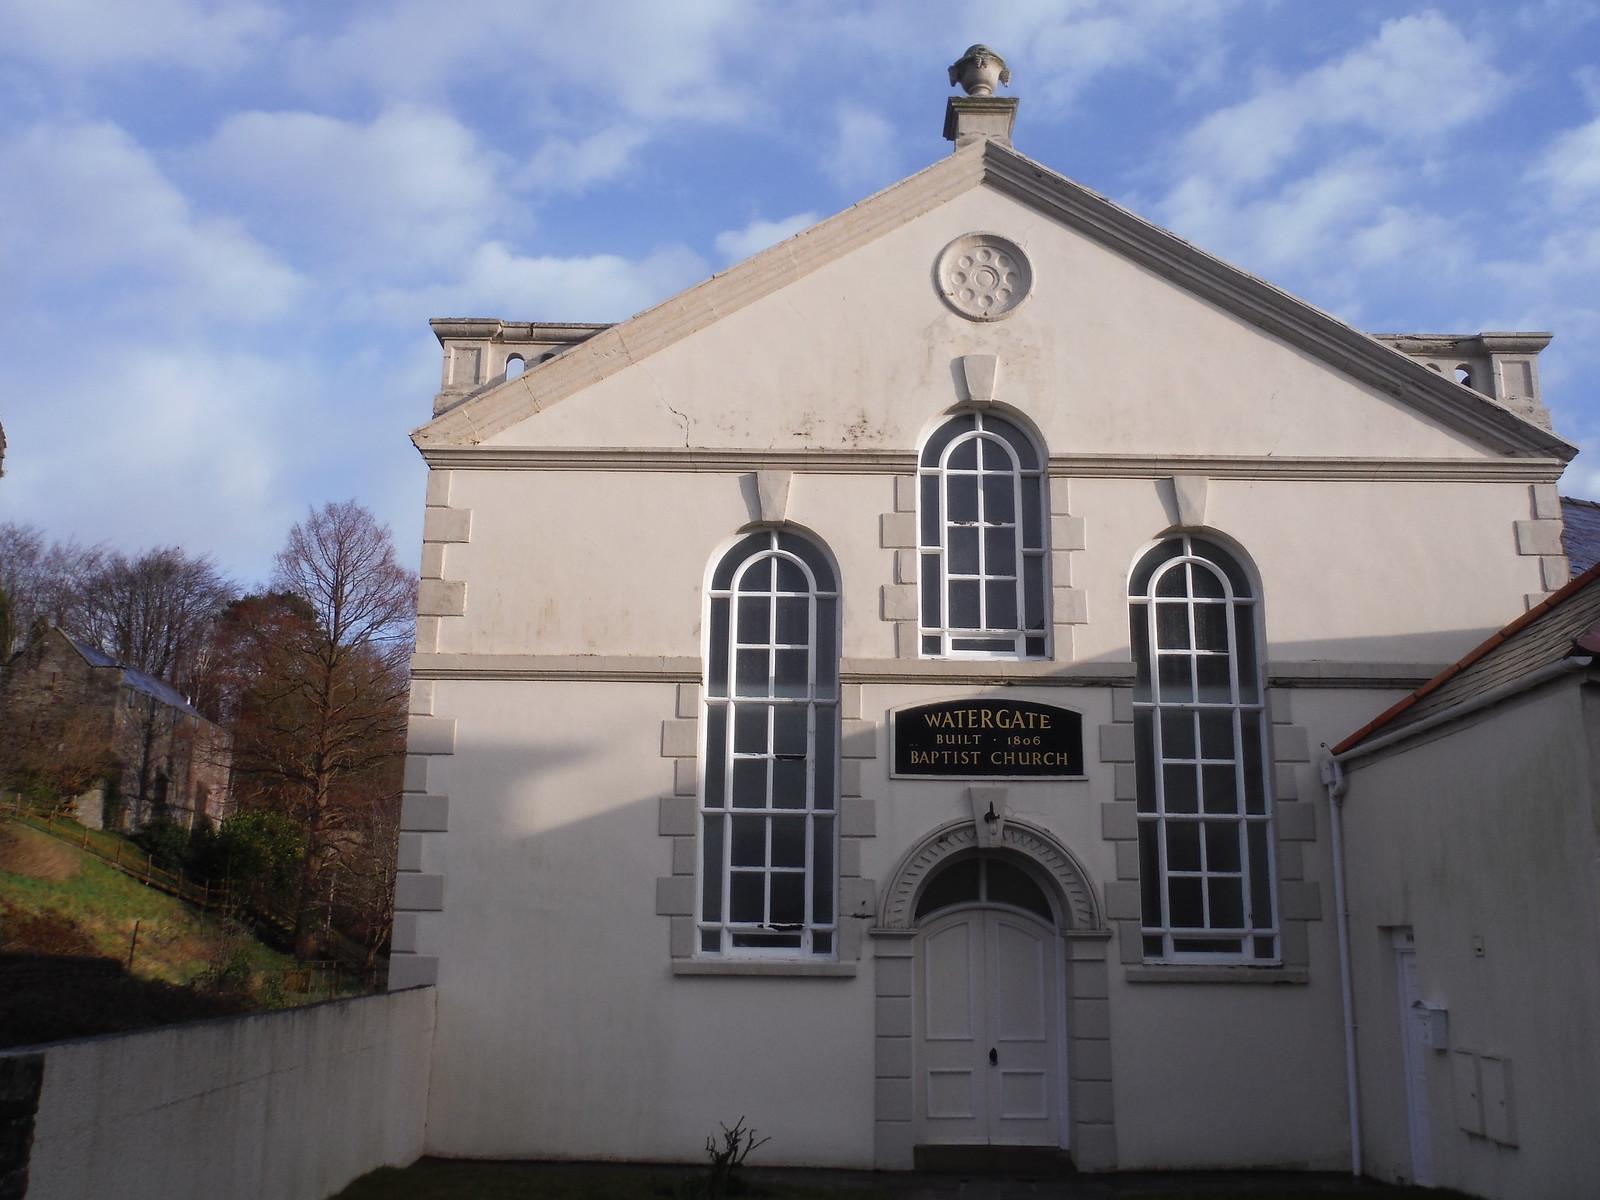 Watergate Baptist Church, Brecon SWC Walk 306 - Brecon Circular (via Y Gaer, Battle and Pen-y-crug)